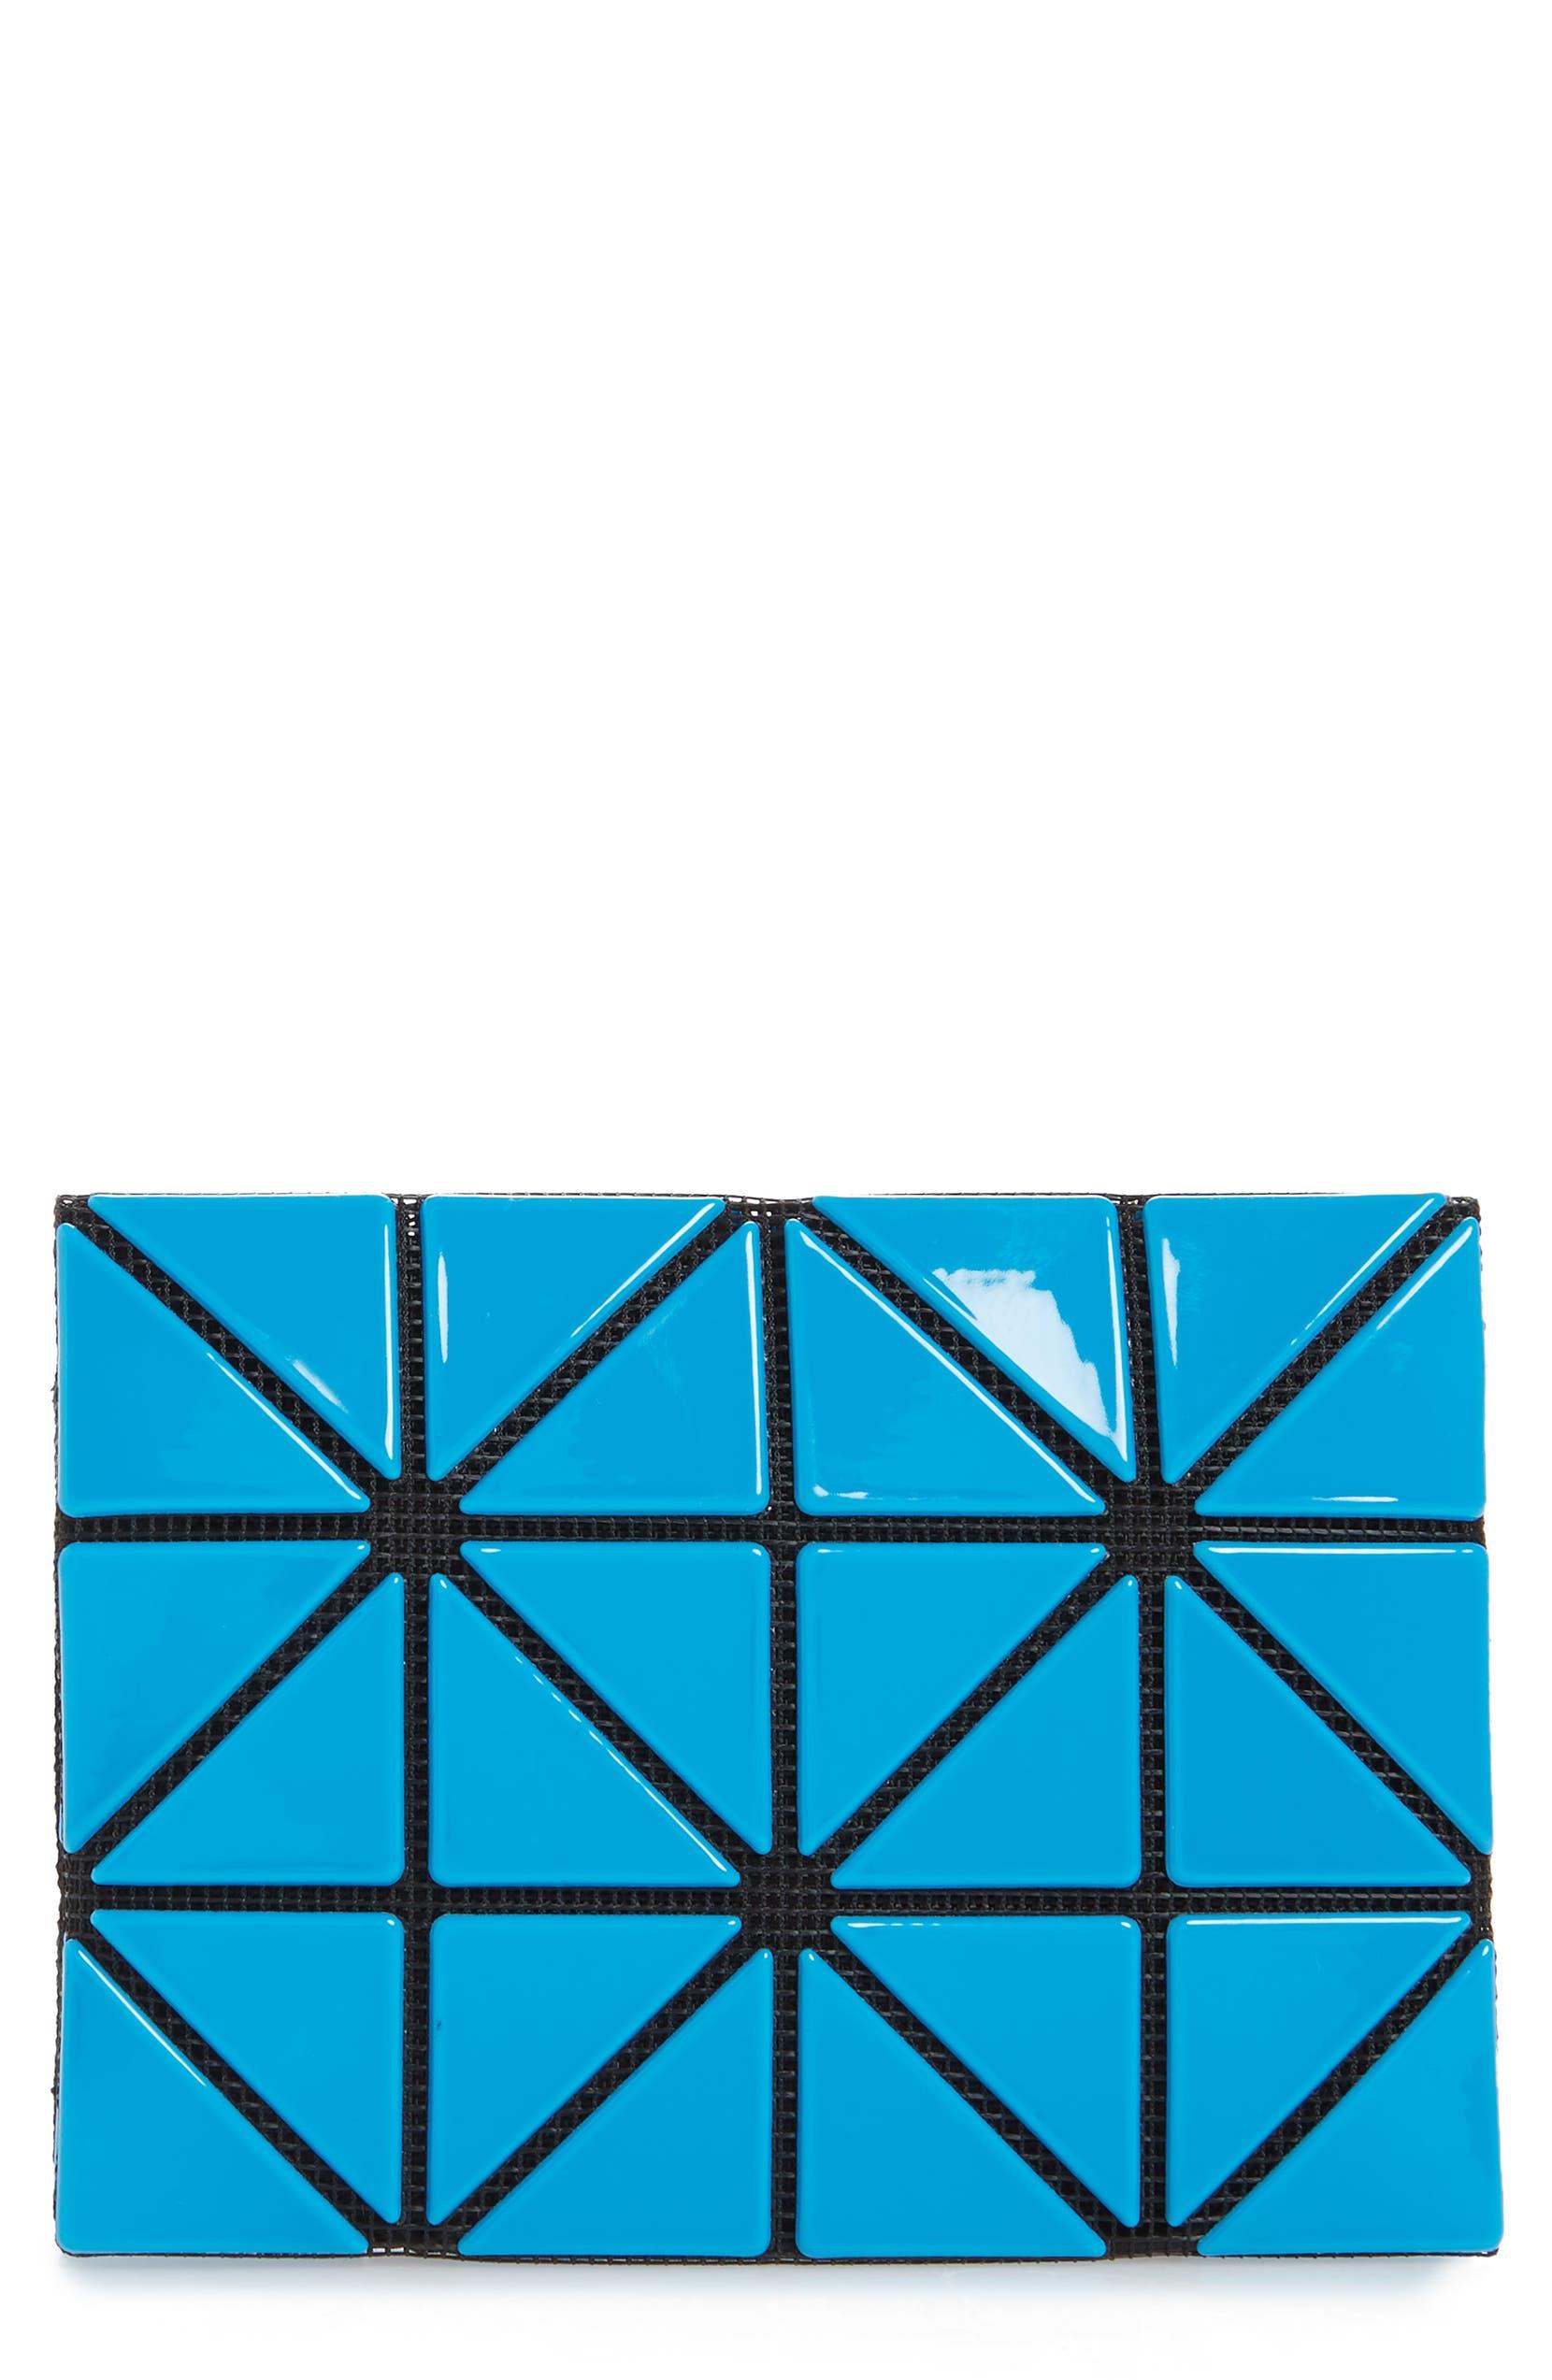 best website 3b1fd 2ca10 Bao Bao Issey Miyake Card Case | Nordstrom